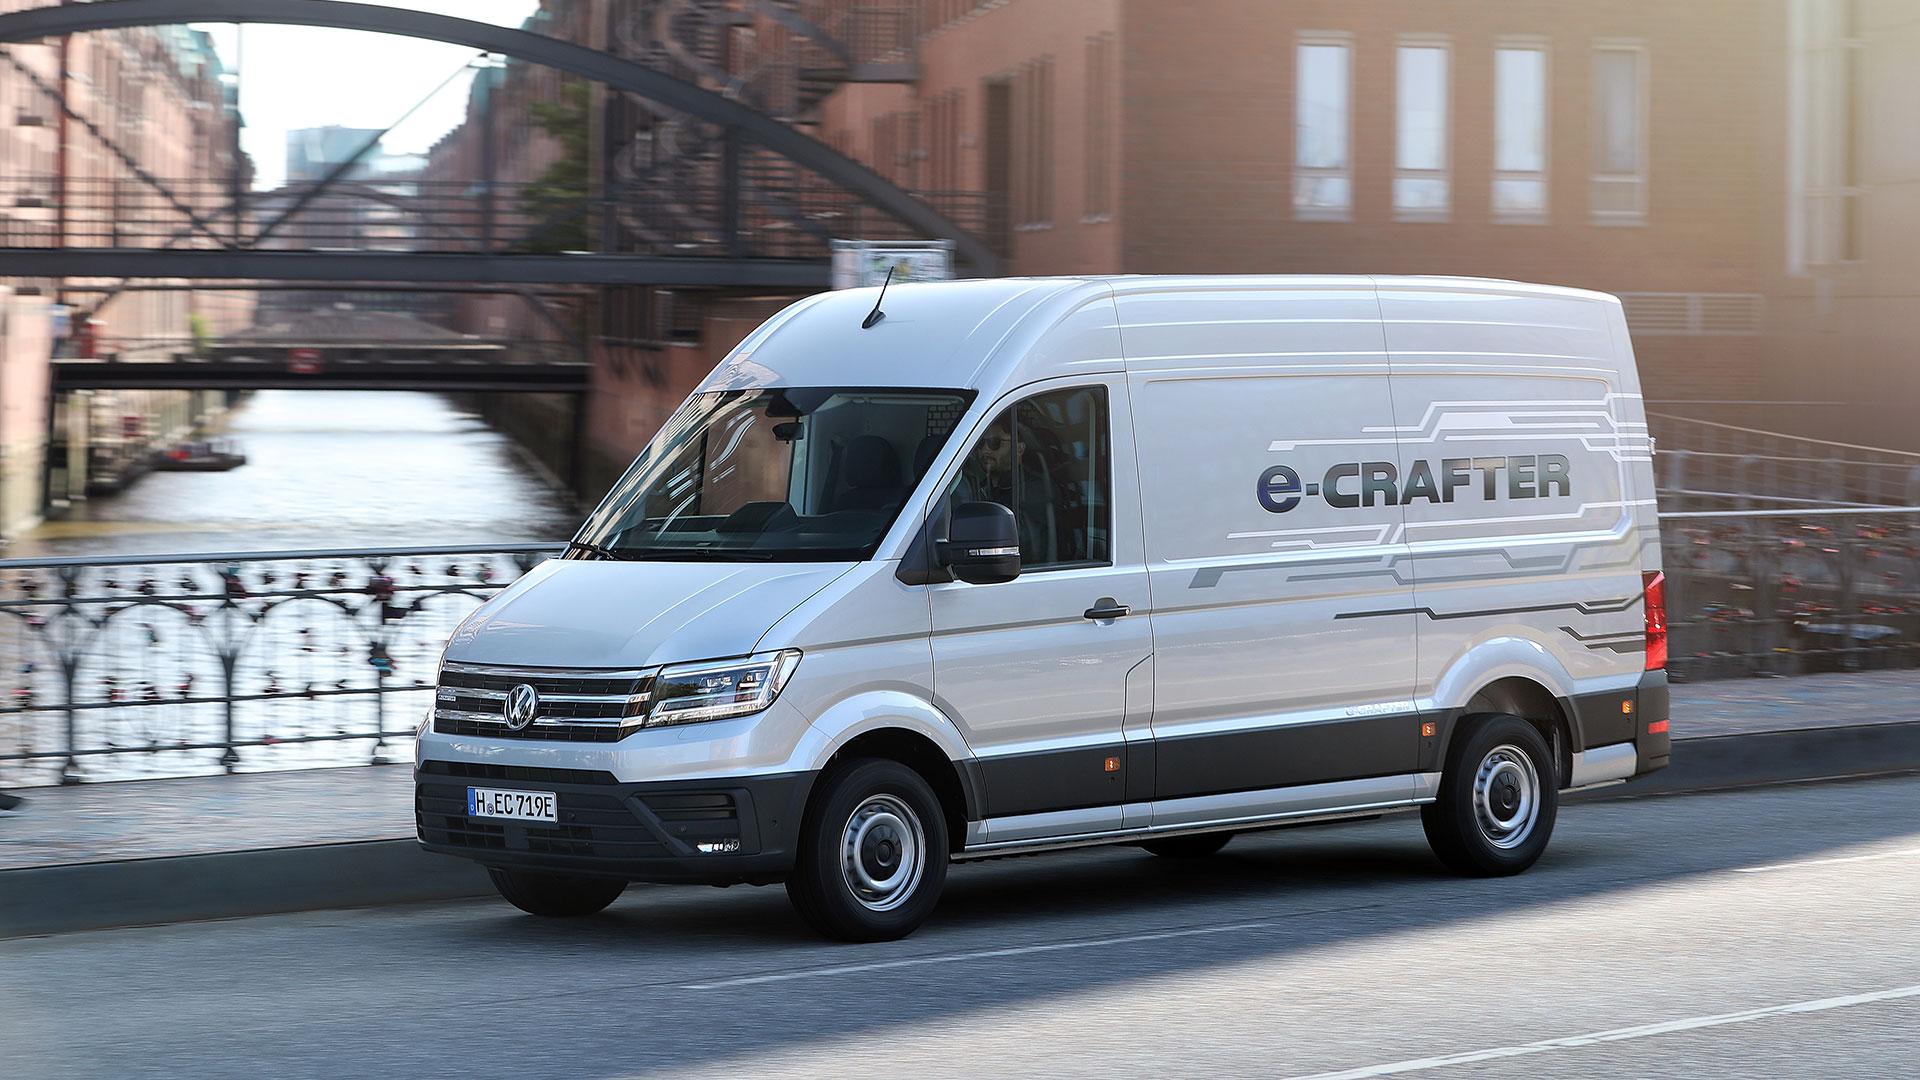 Used Volkswagen Crafter Vans For Sale Autotrader Vans